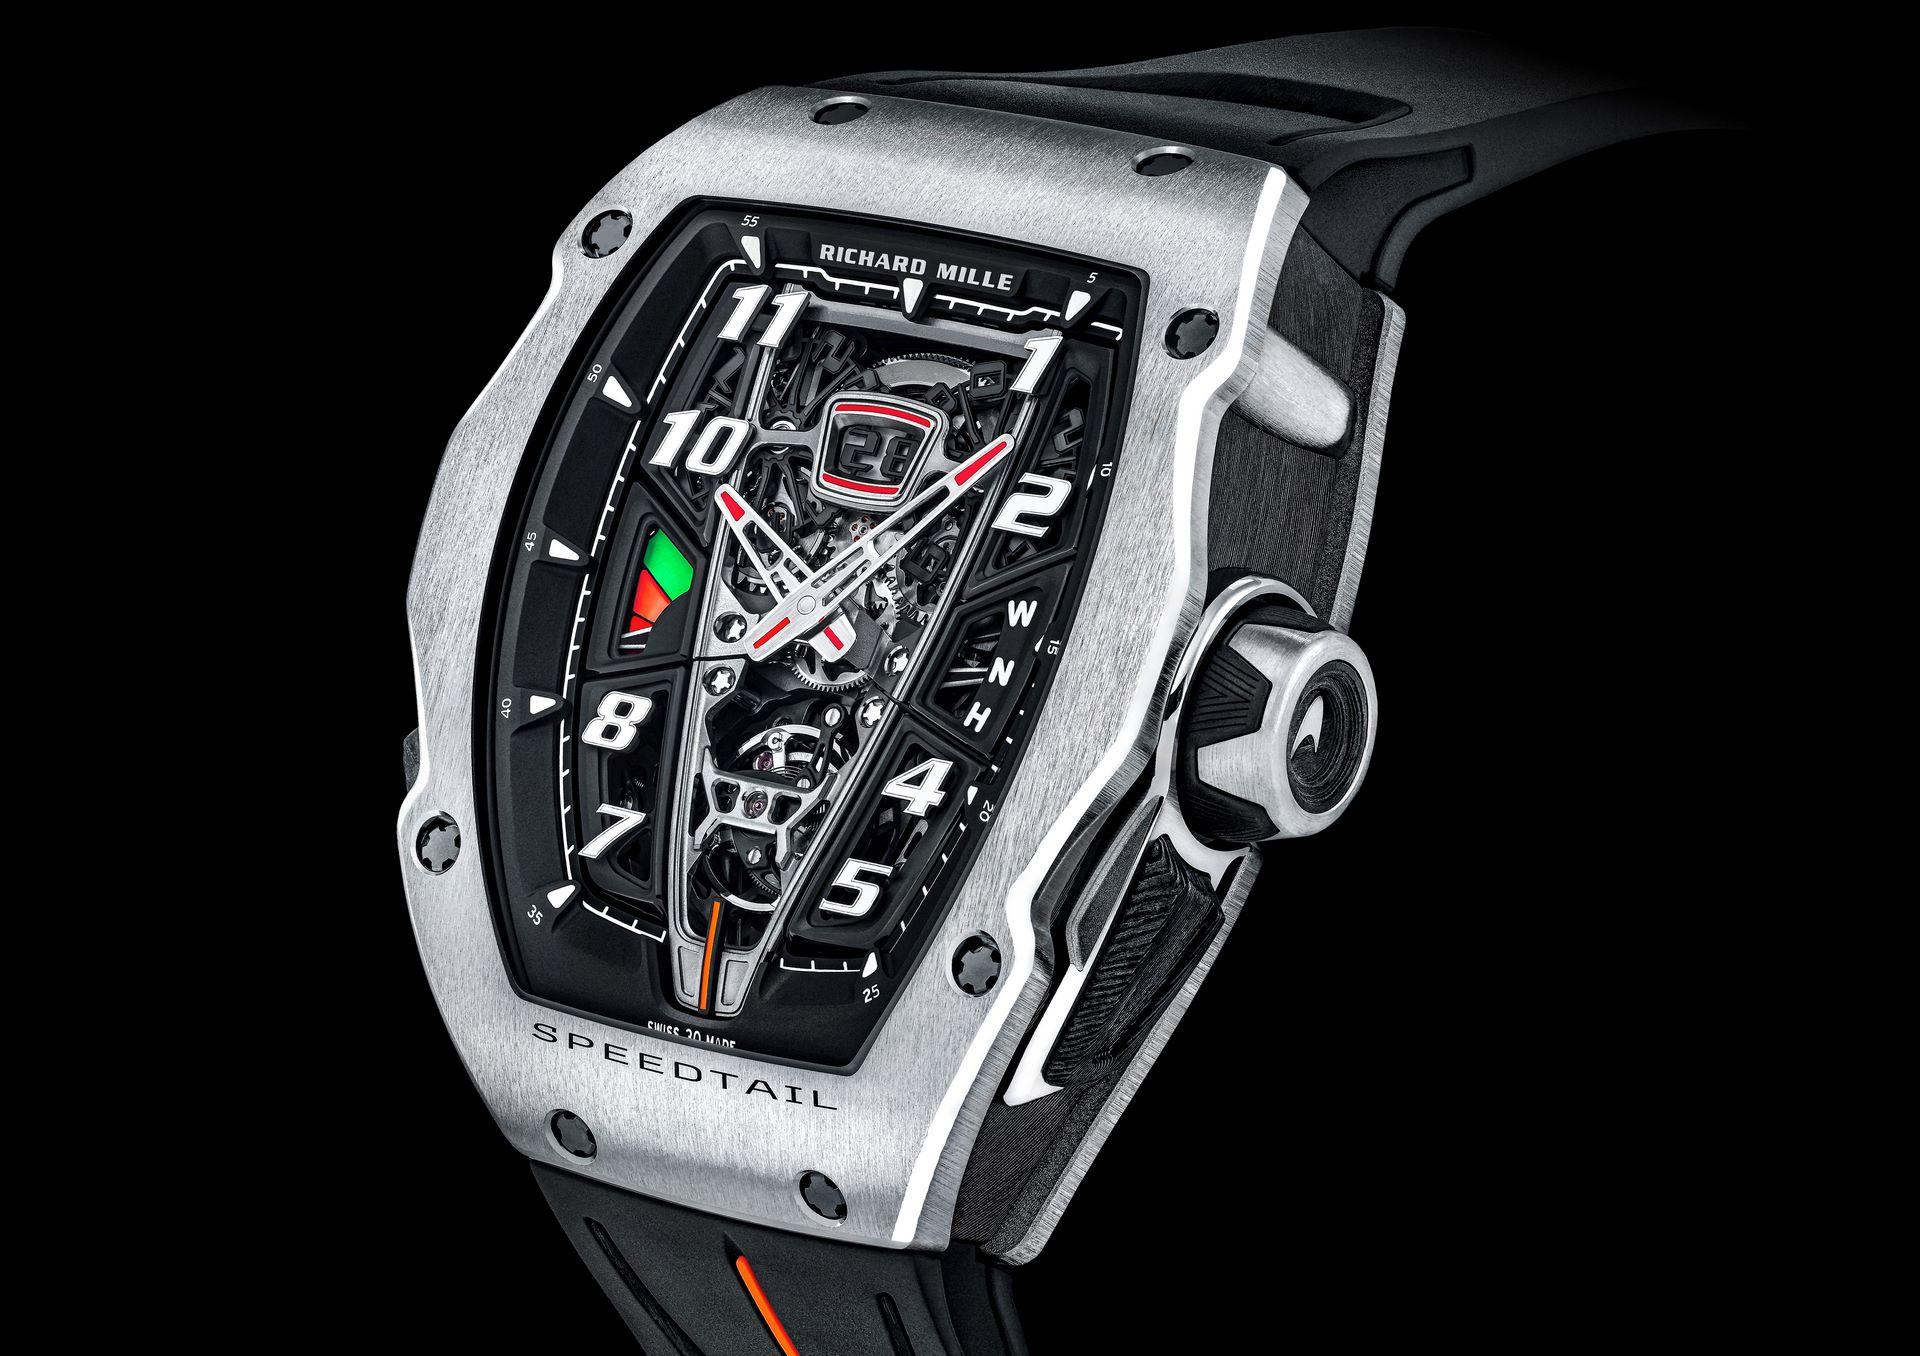 Richard-Mille-RM-40-01-Speedtail-1